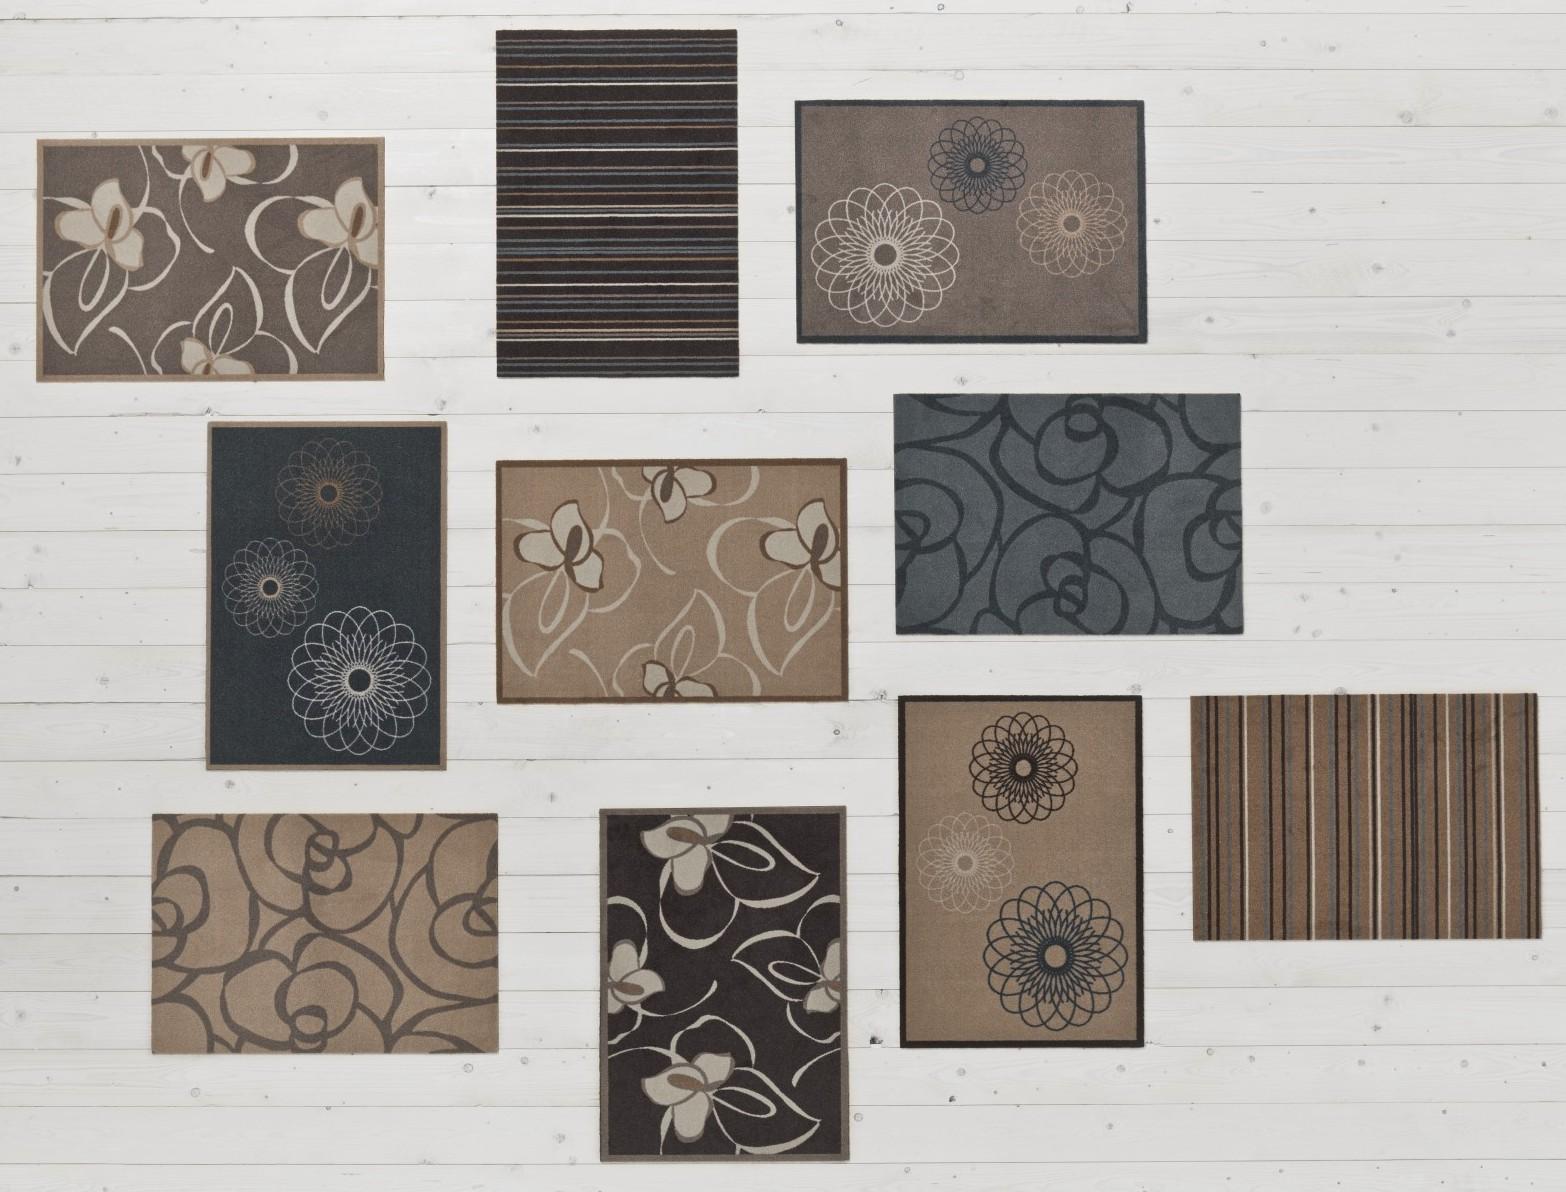 sauberlaufmatten. Black Bedroom Furniture Sets. Home Design Ideas